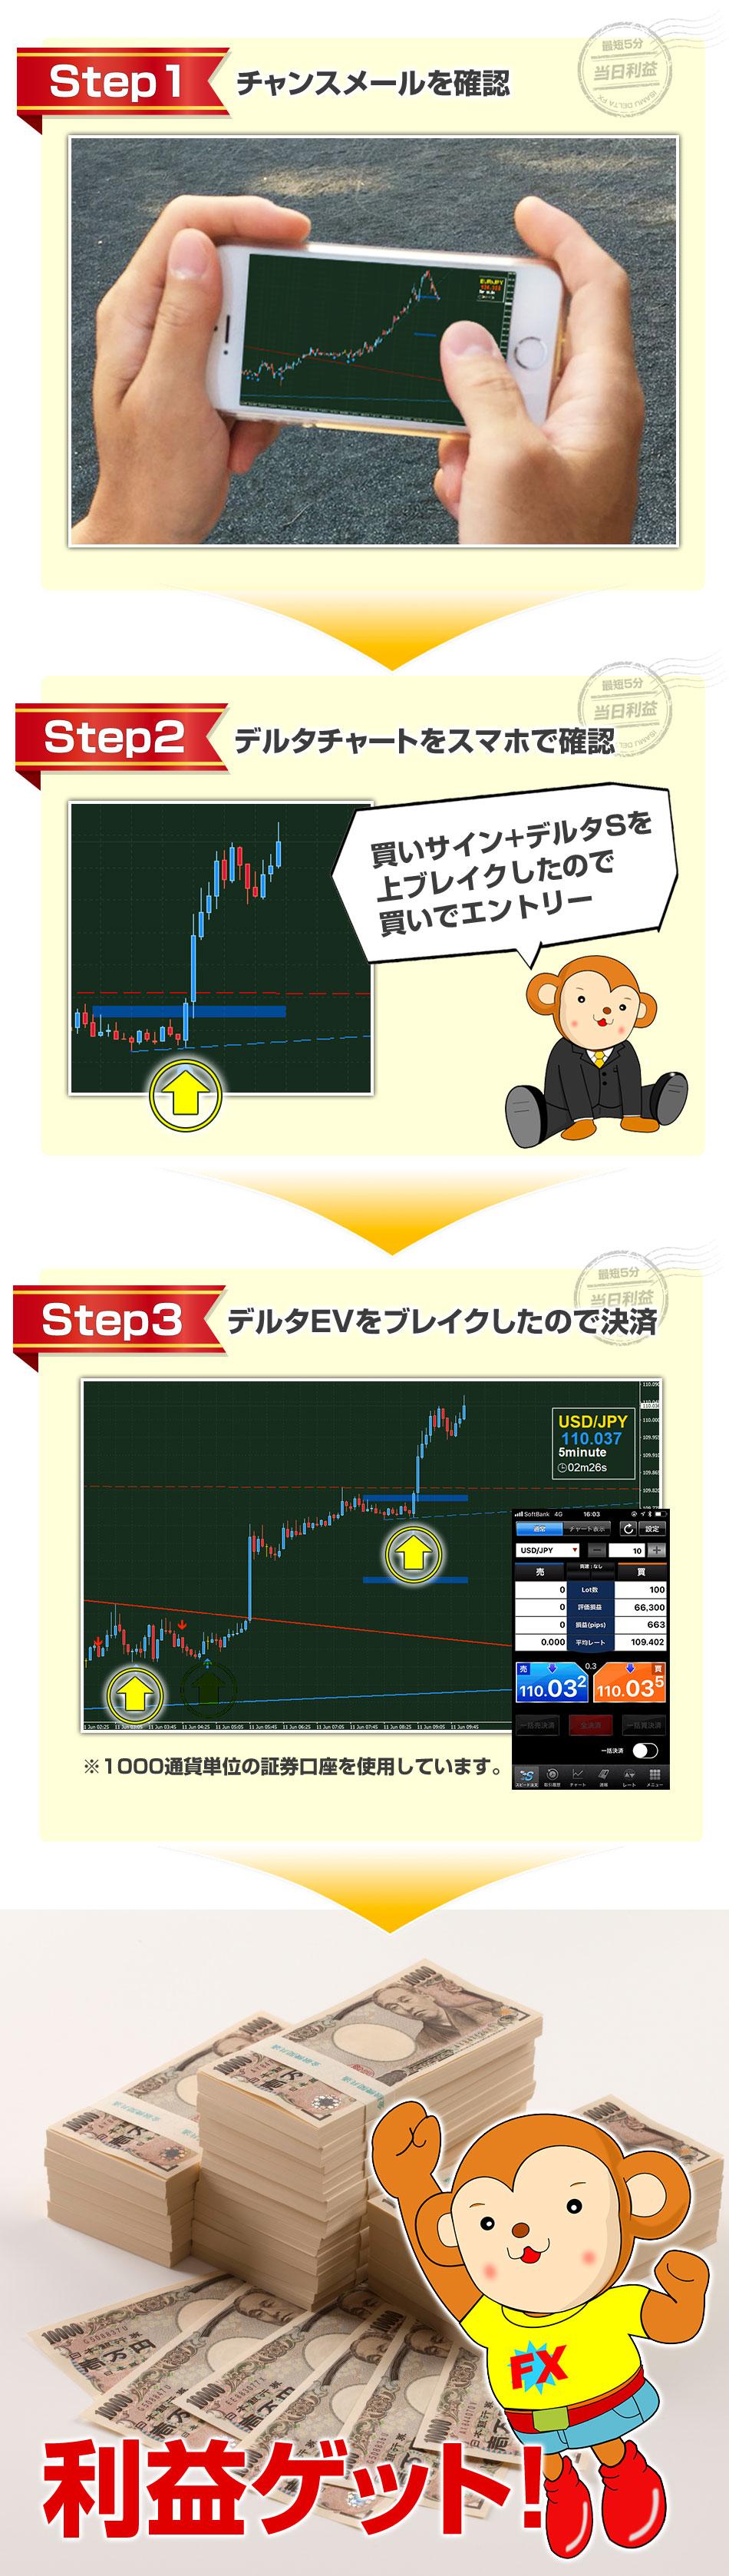 img_step